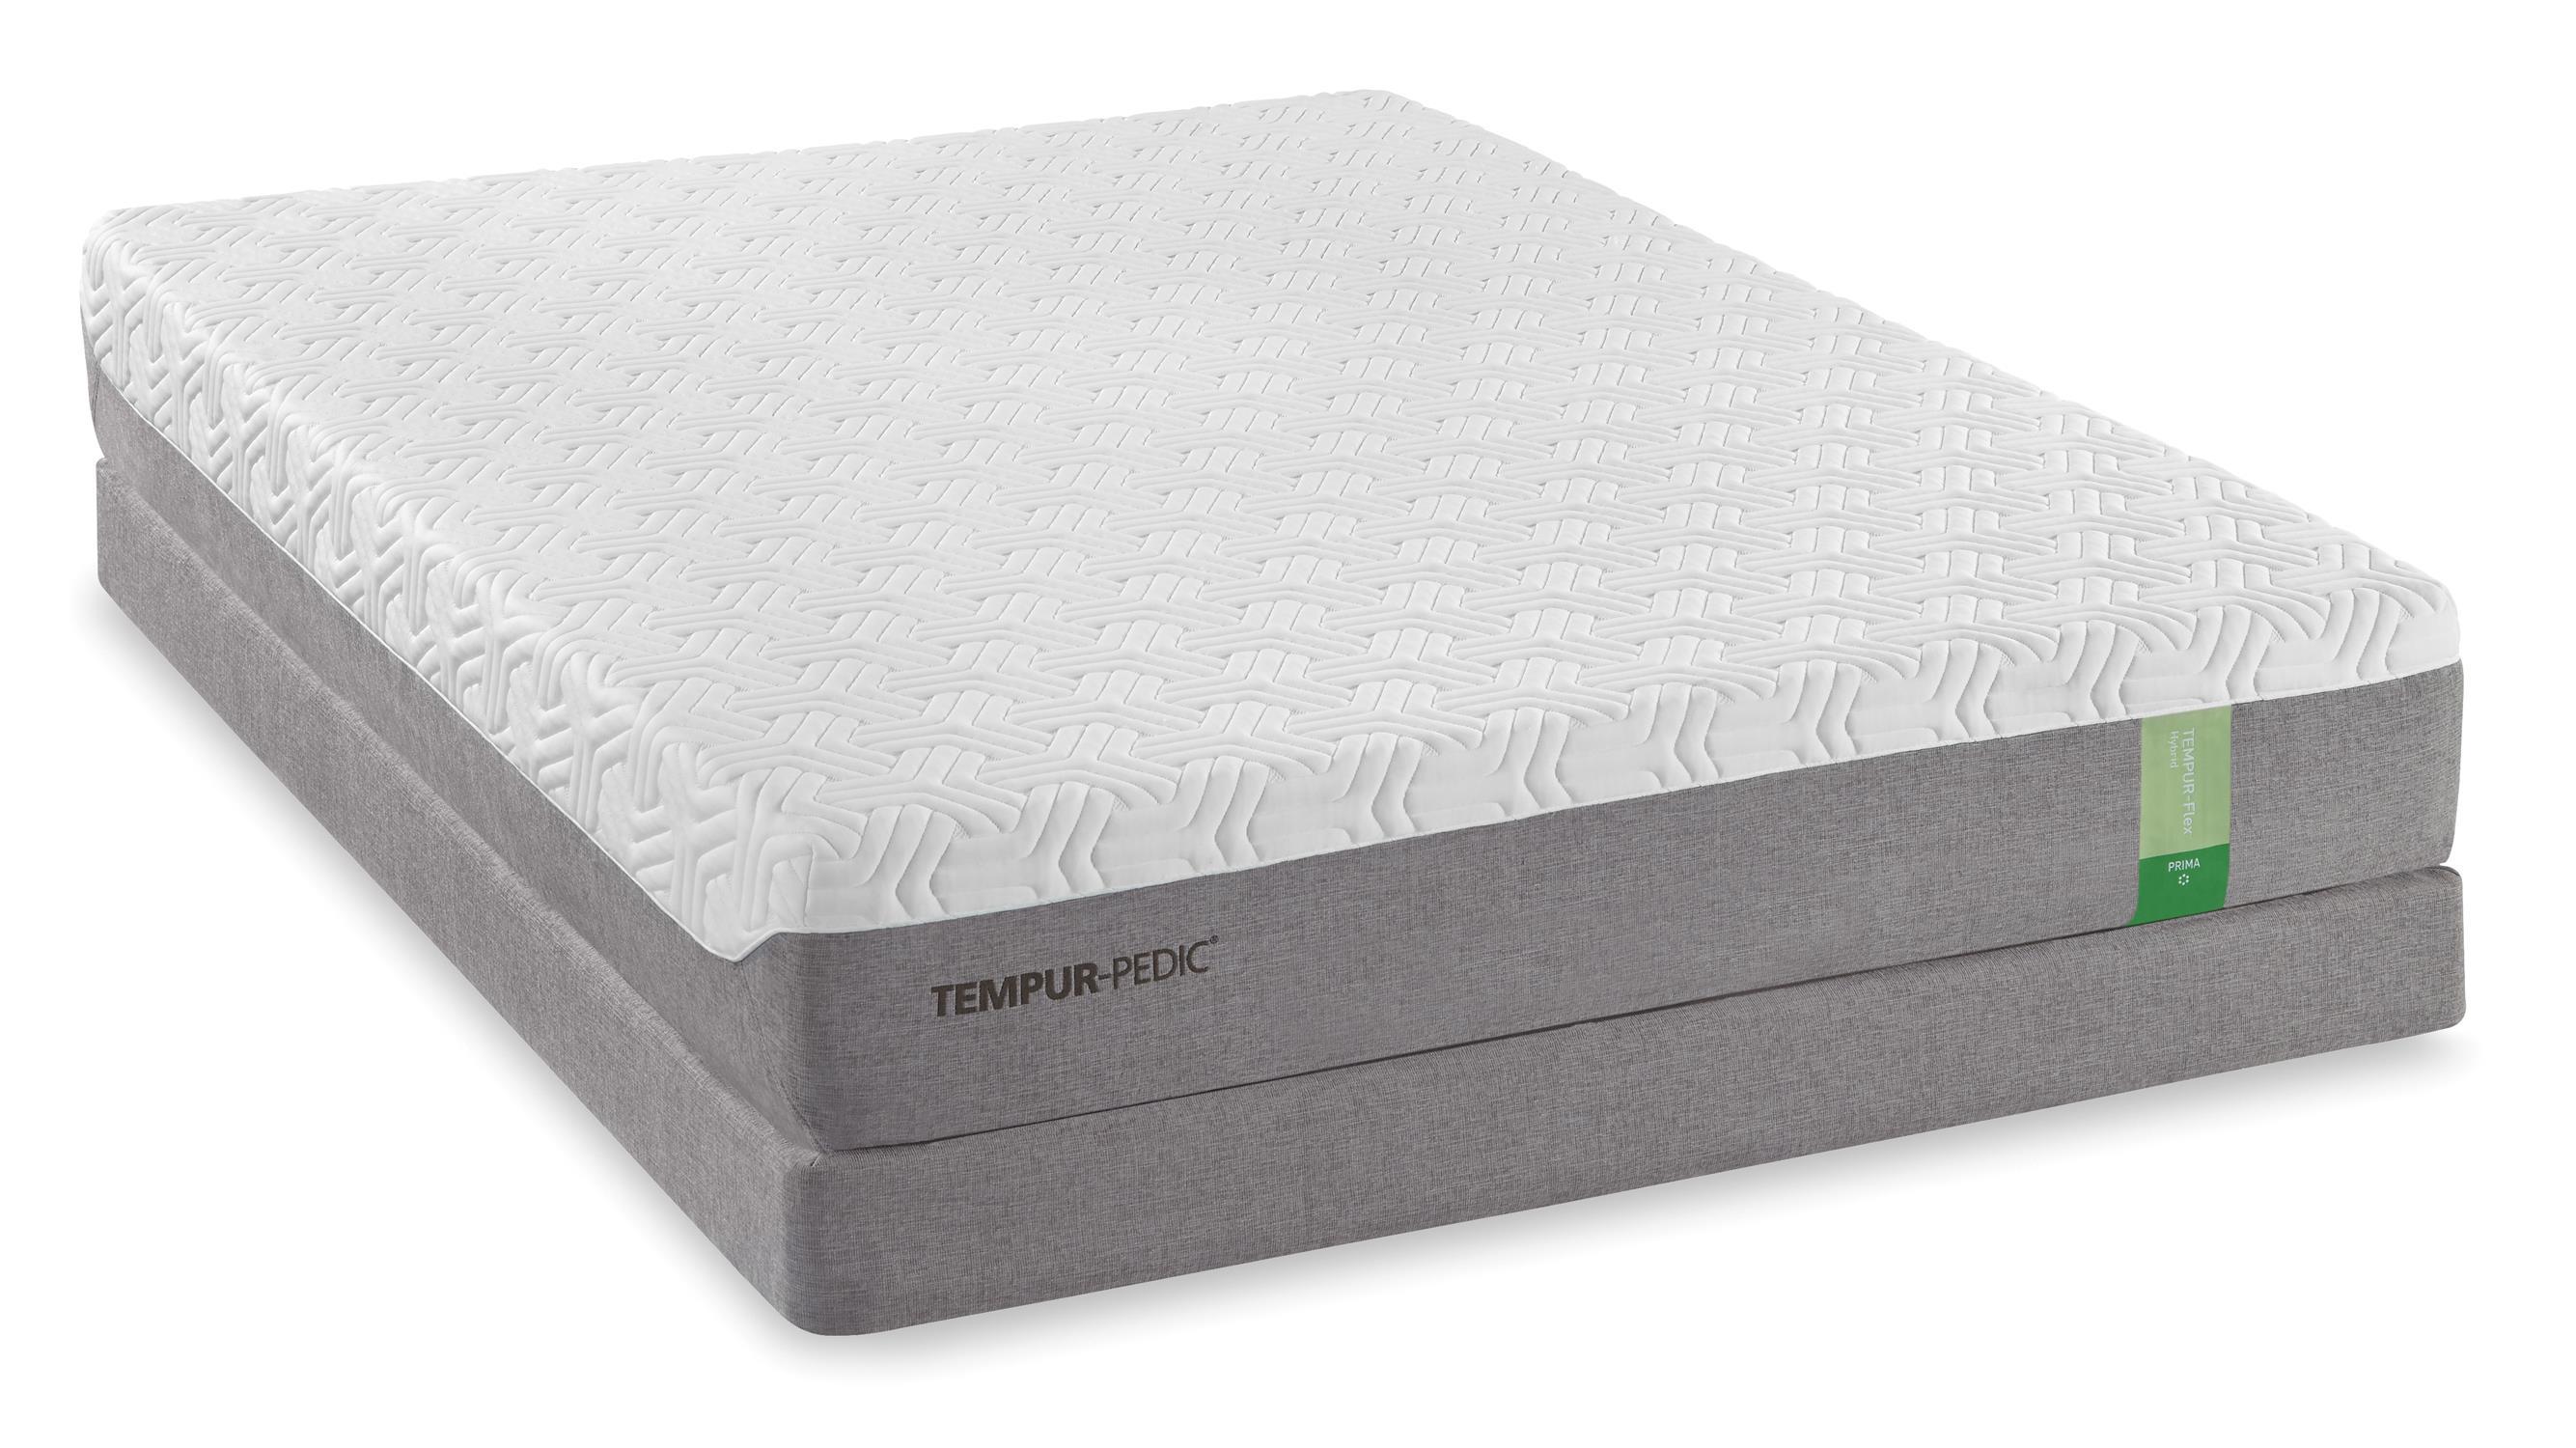 Tempur-Pedic® TEMPUR-Flex Prima Twin Medium Firm Mattress Set - Item Number: 10115210+25565210